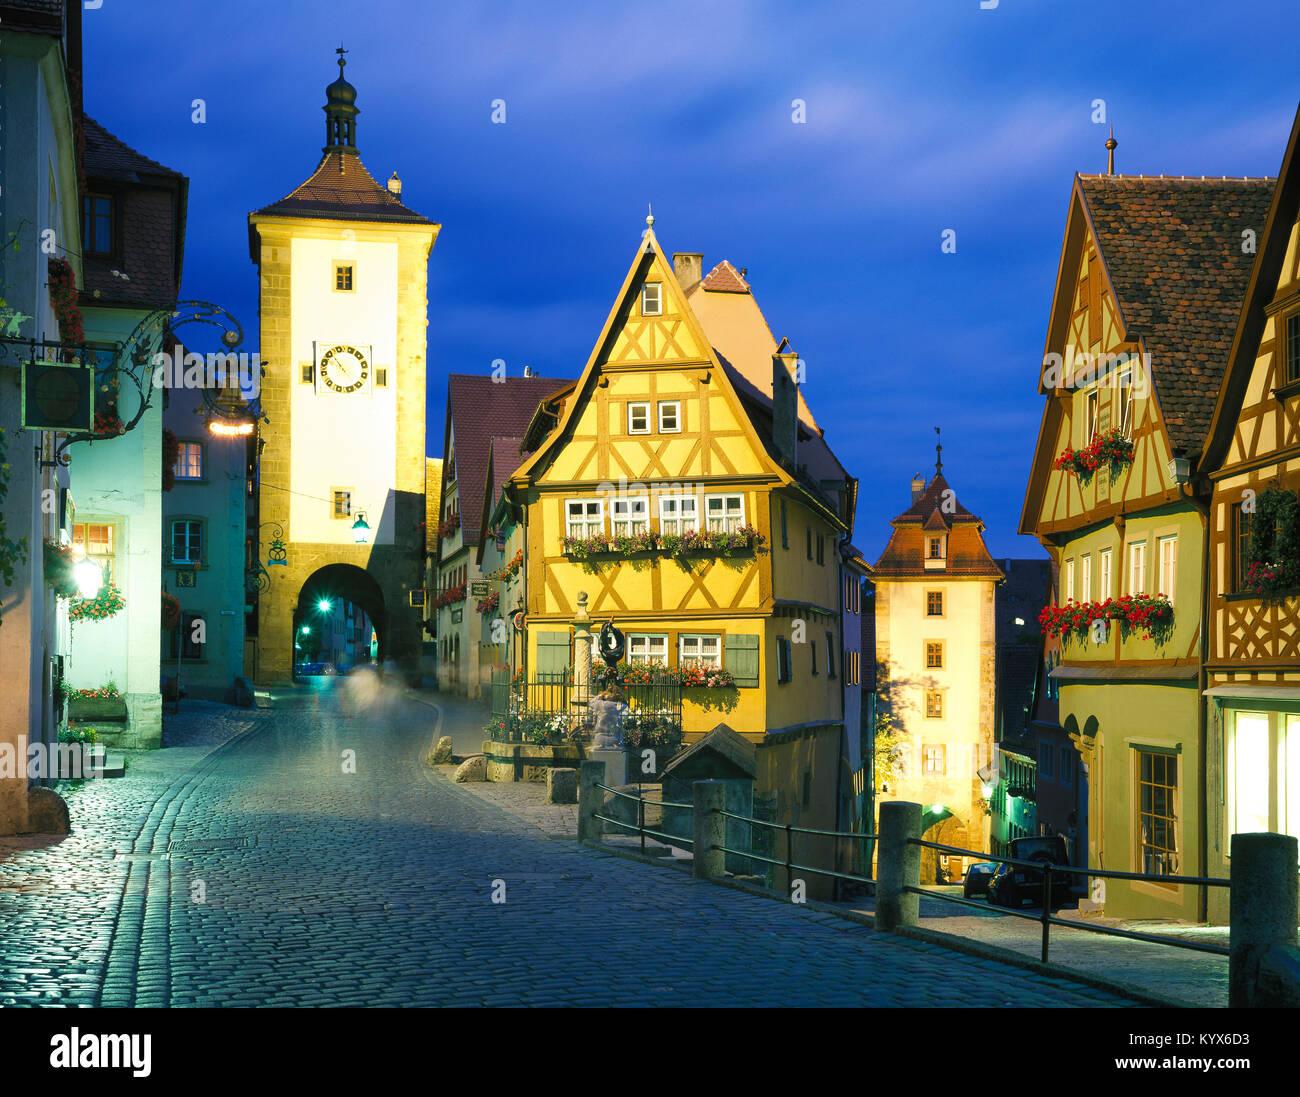 The Plonlein, Rothenburg ob der Tauber, Bavaria, Germany - Stock Image